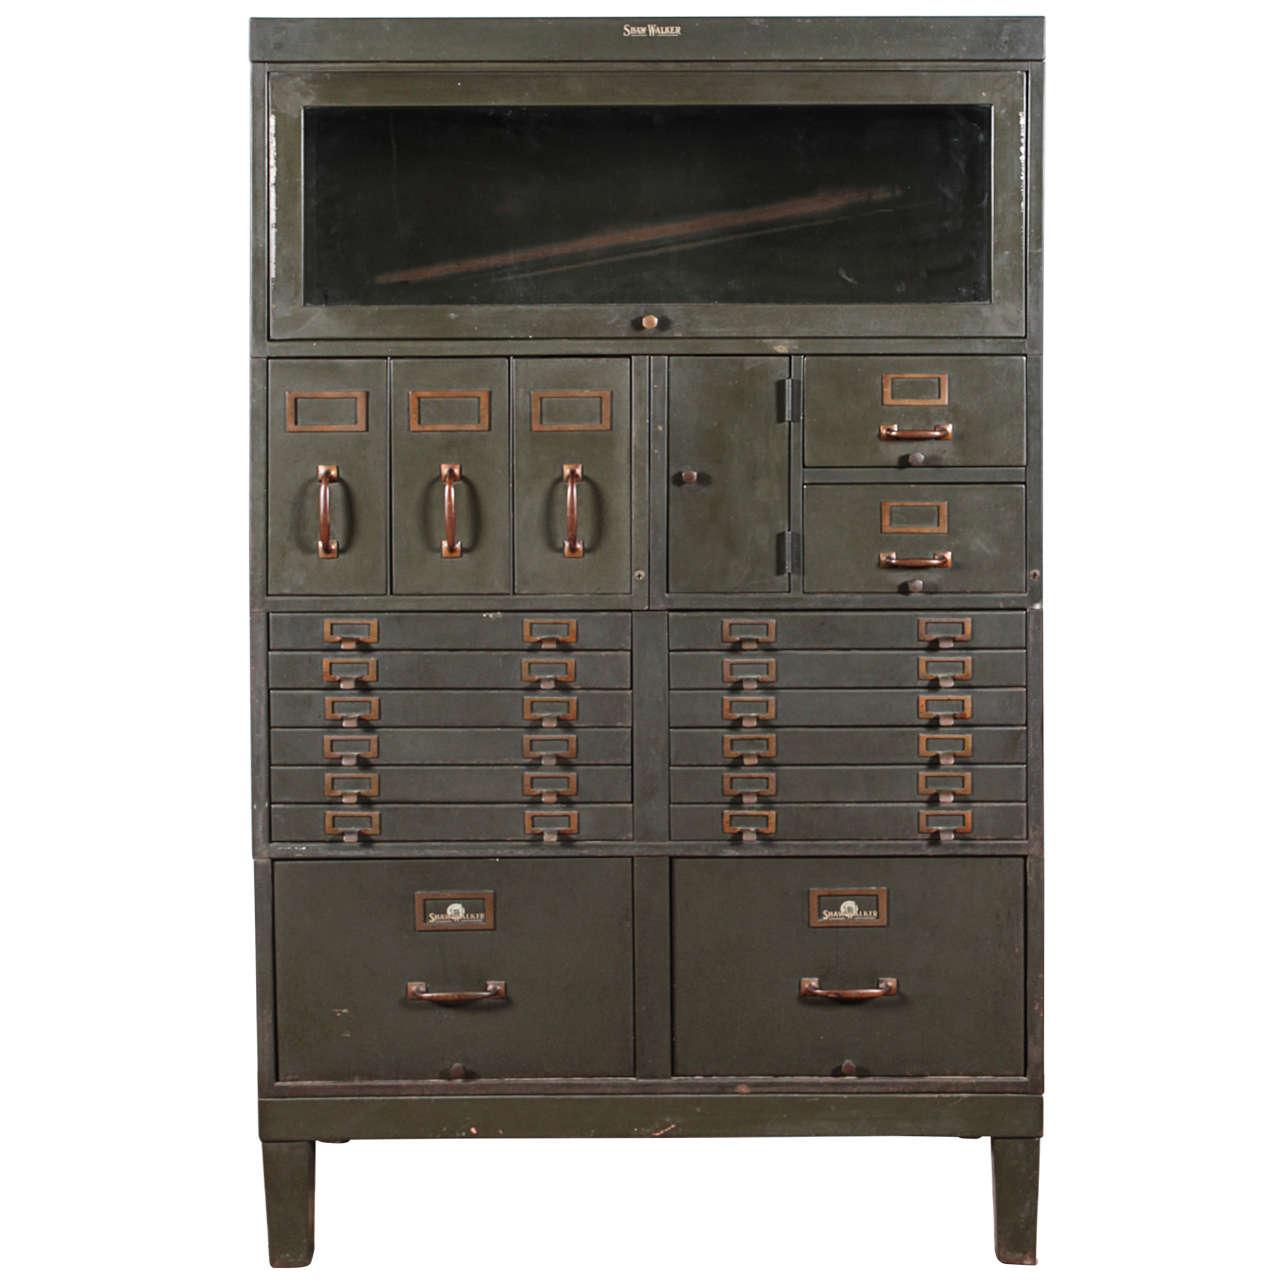 Vintage Shaw Walker Industrial Office Cabinet at 1stdibs